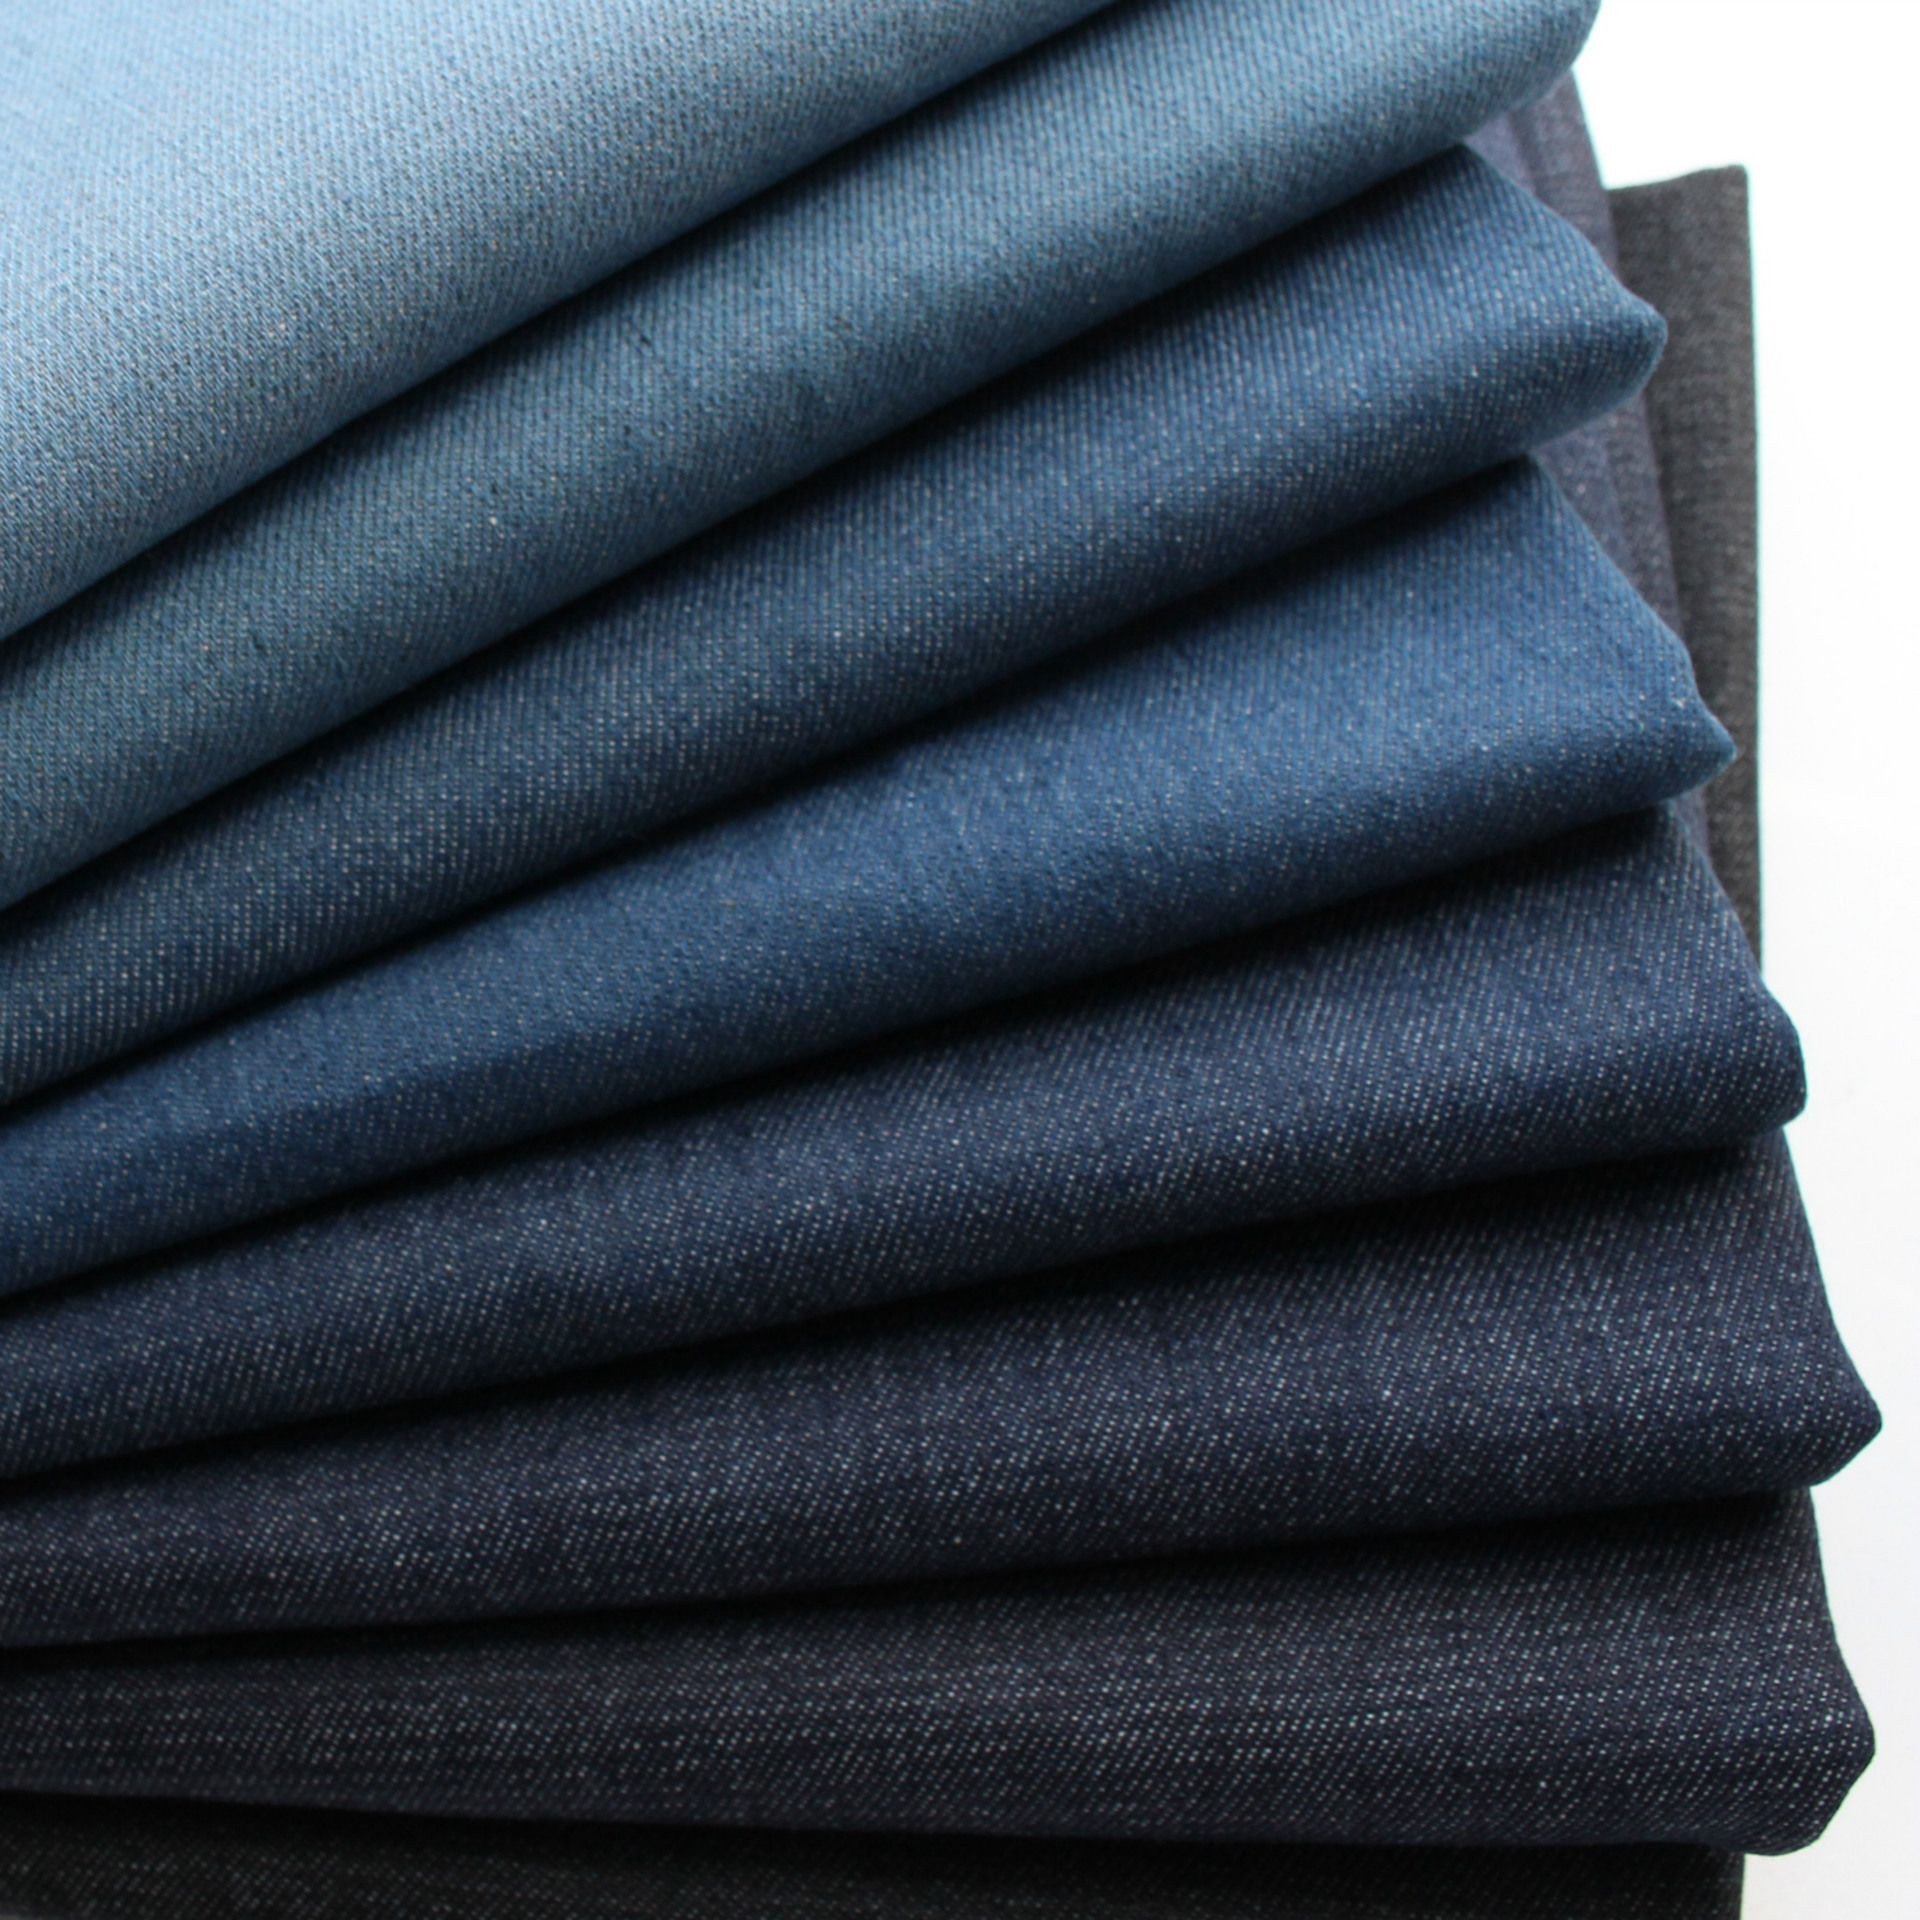 Denim Fabric For Cloth